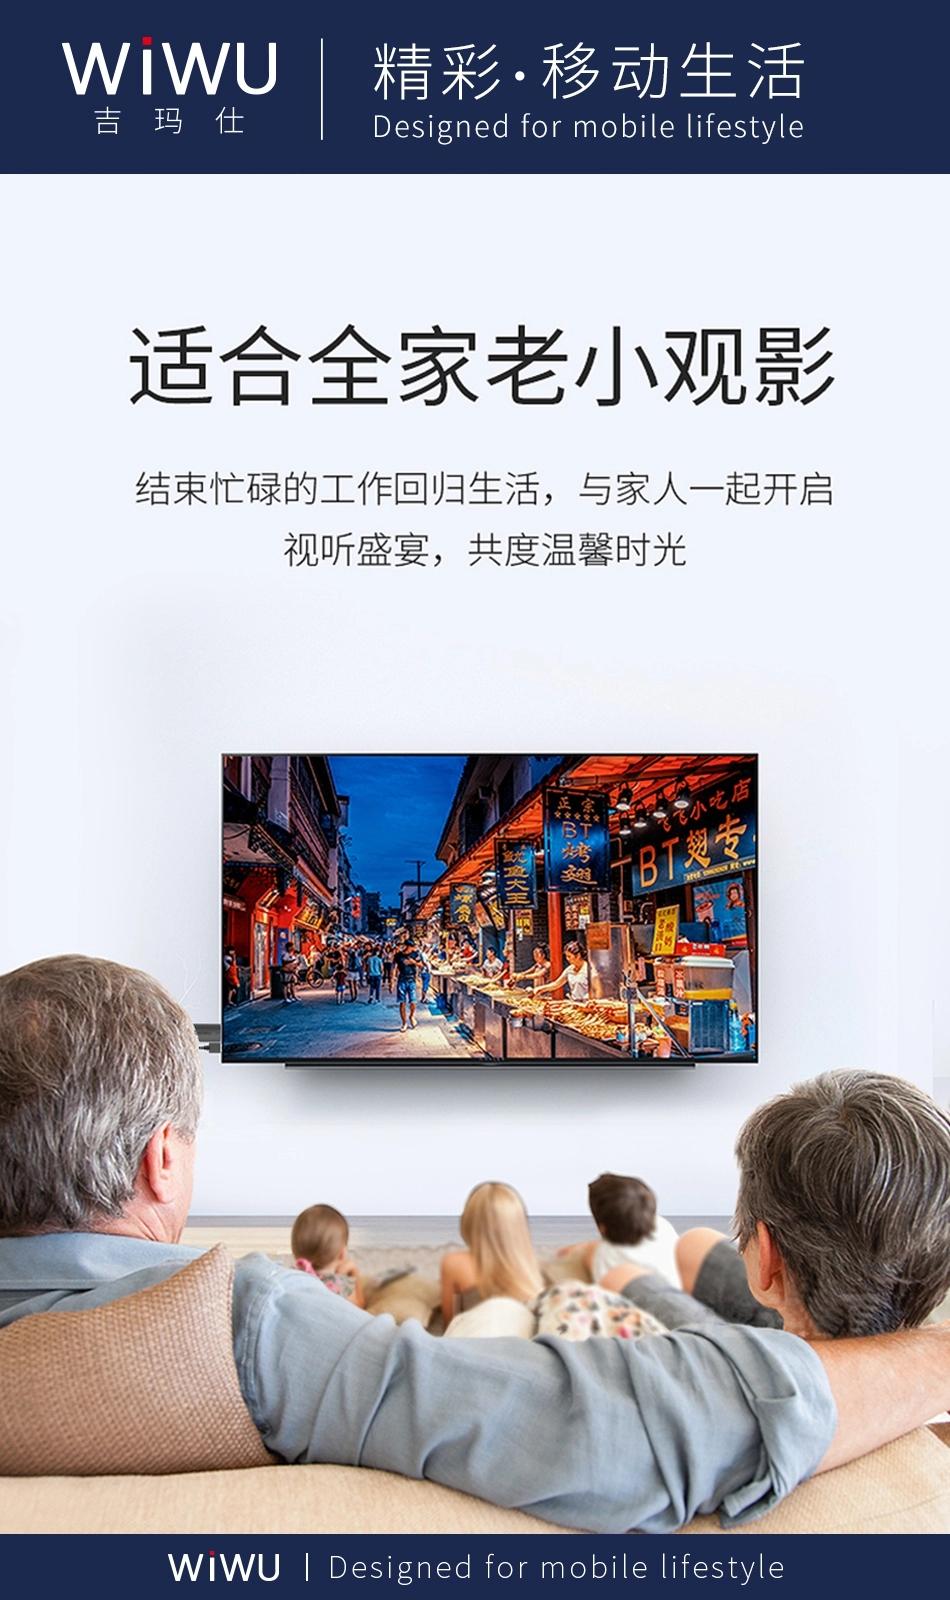 WIWU 苹果HDMI视频输出数据线 (https://www.wiwu.net.cn/) 数据线 第5张